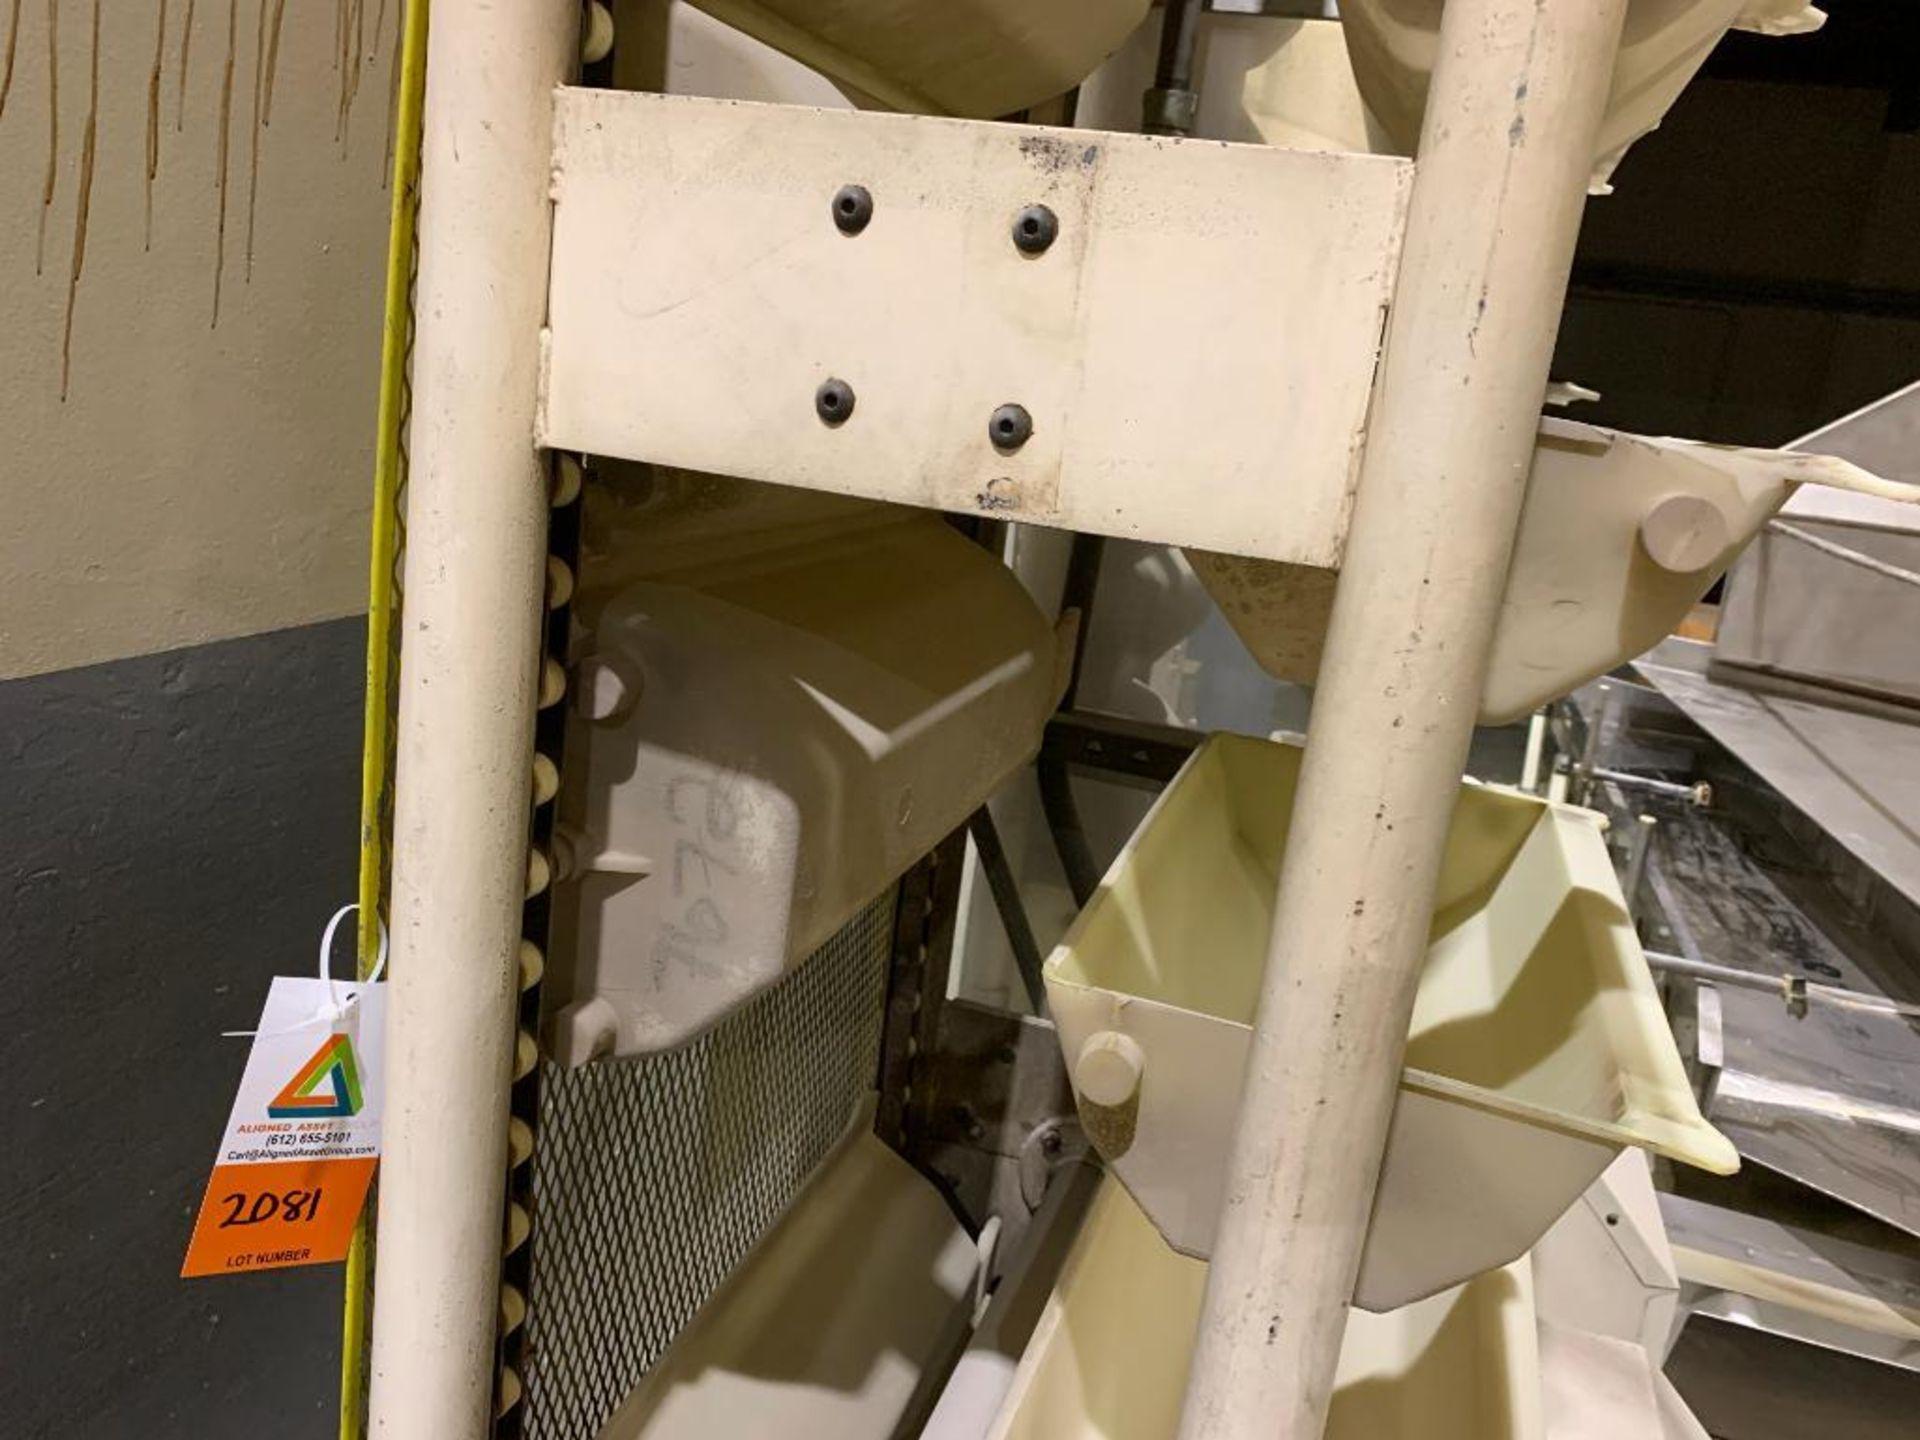 1990 Aseeco horizontal bucket elevator, model ALH-0-24 - Image 9 of 12